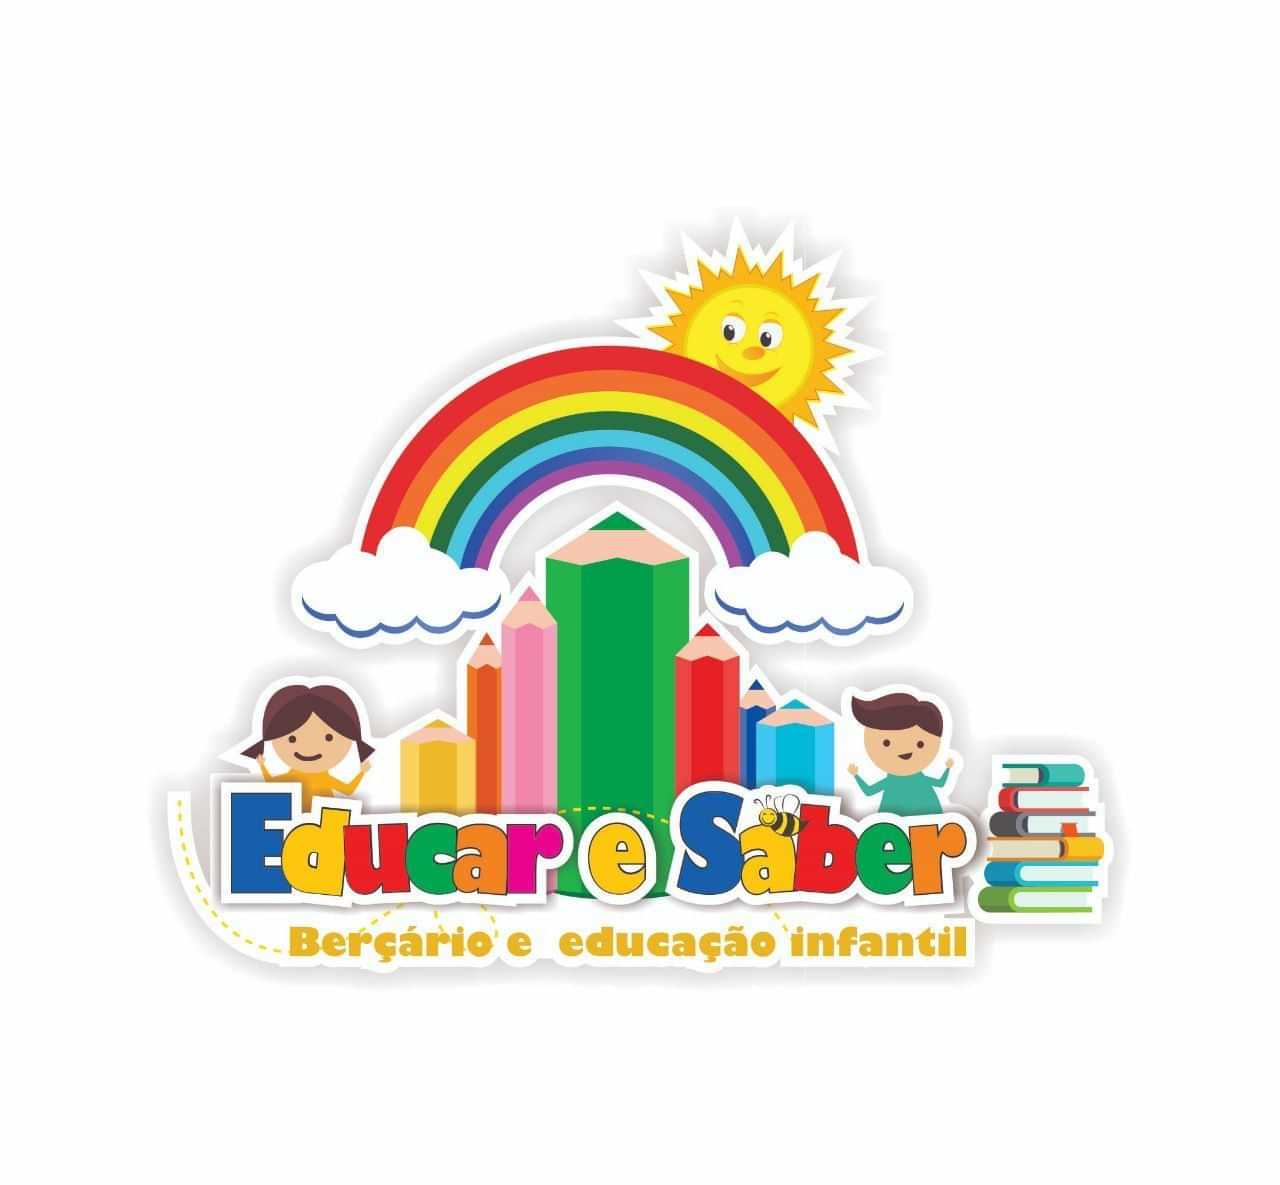 Centro Educacional Educar e Aprender